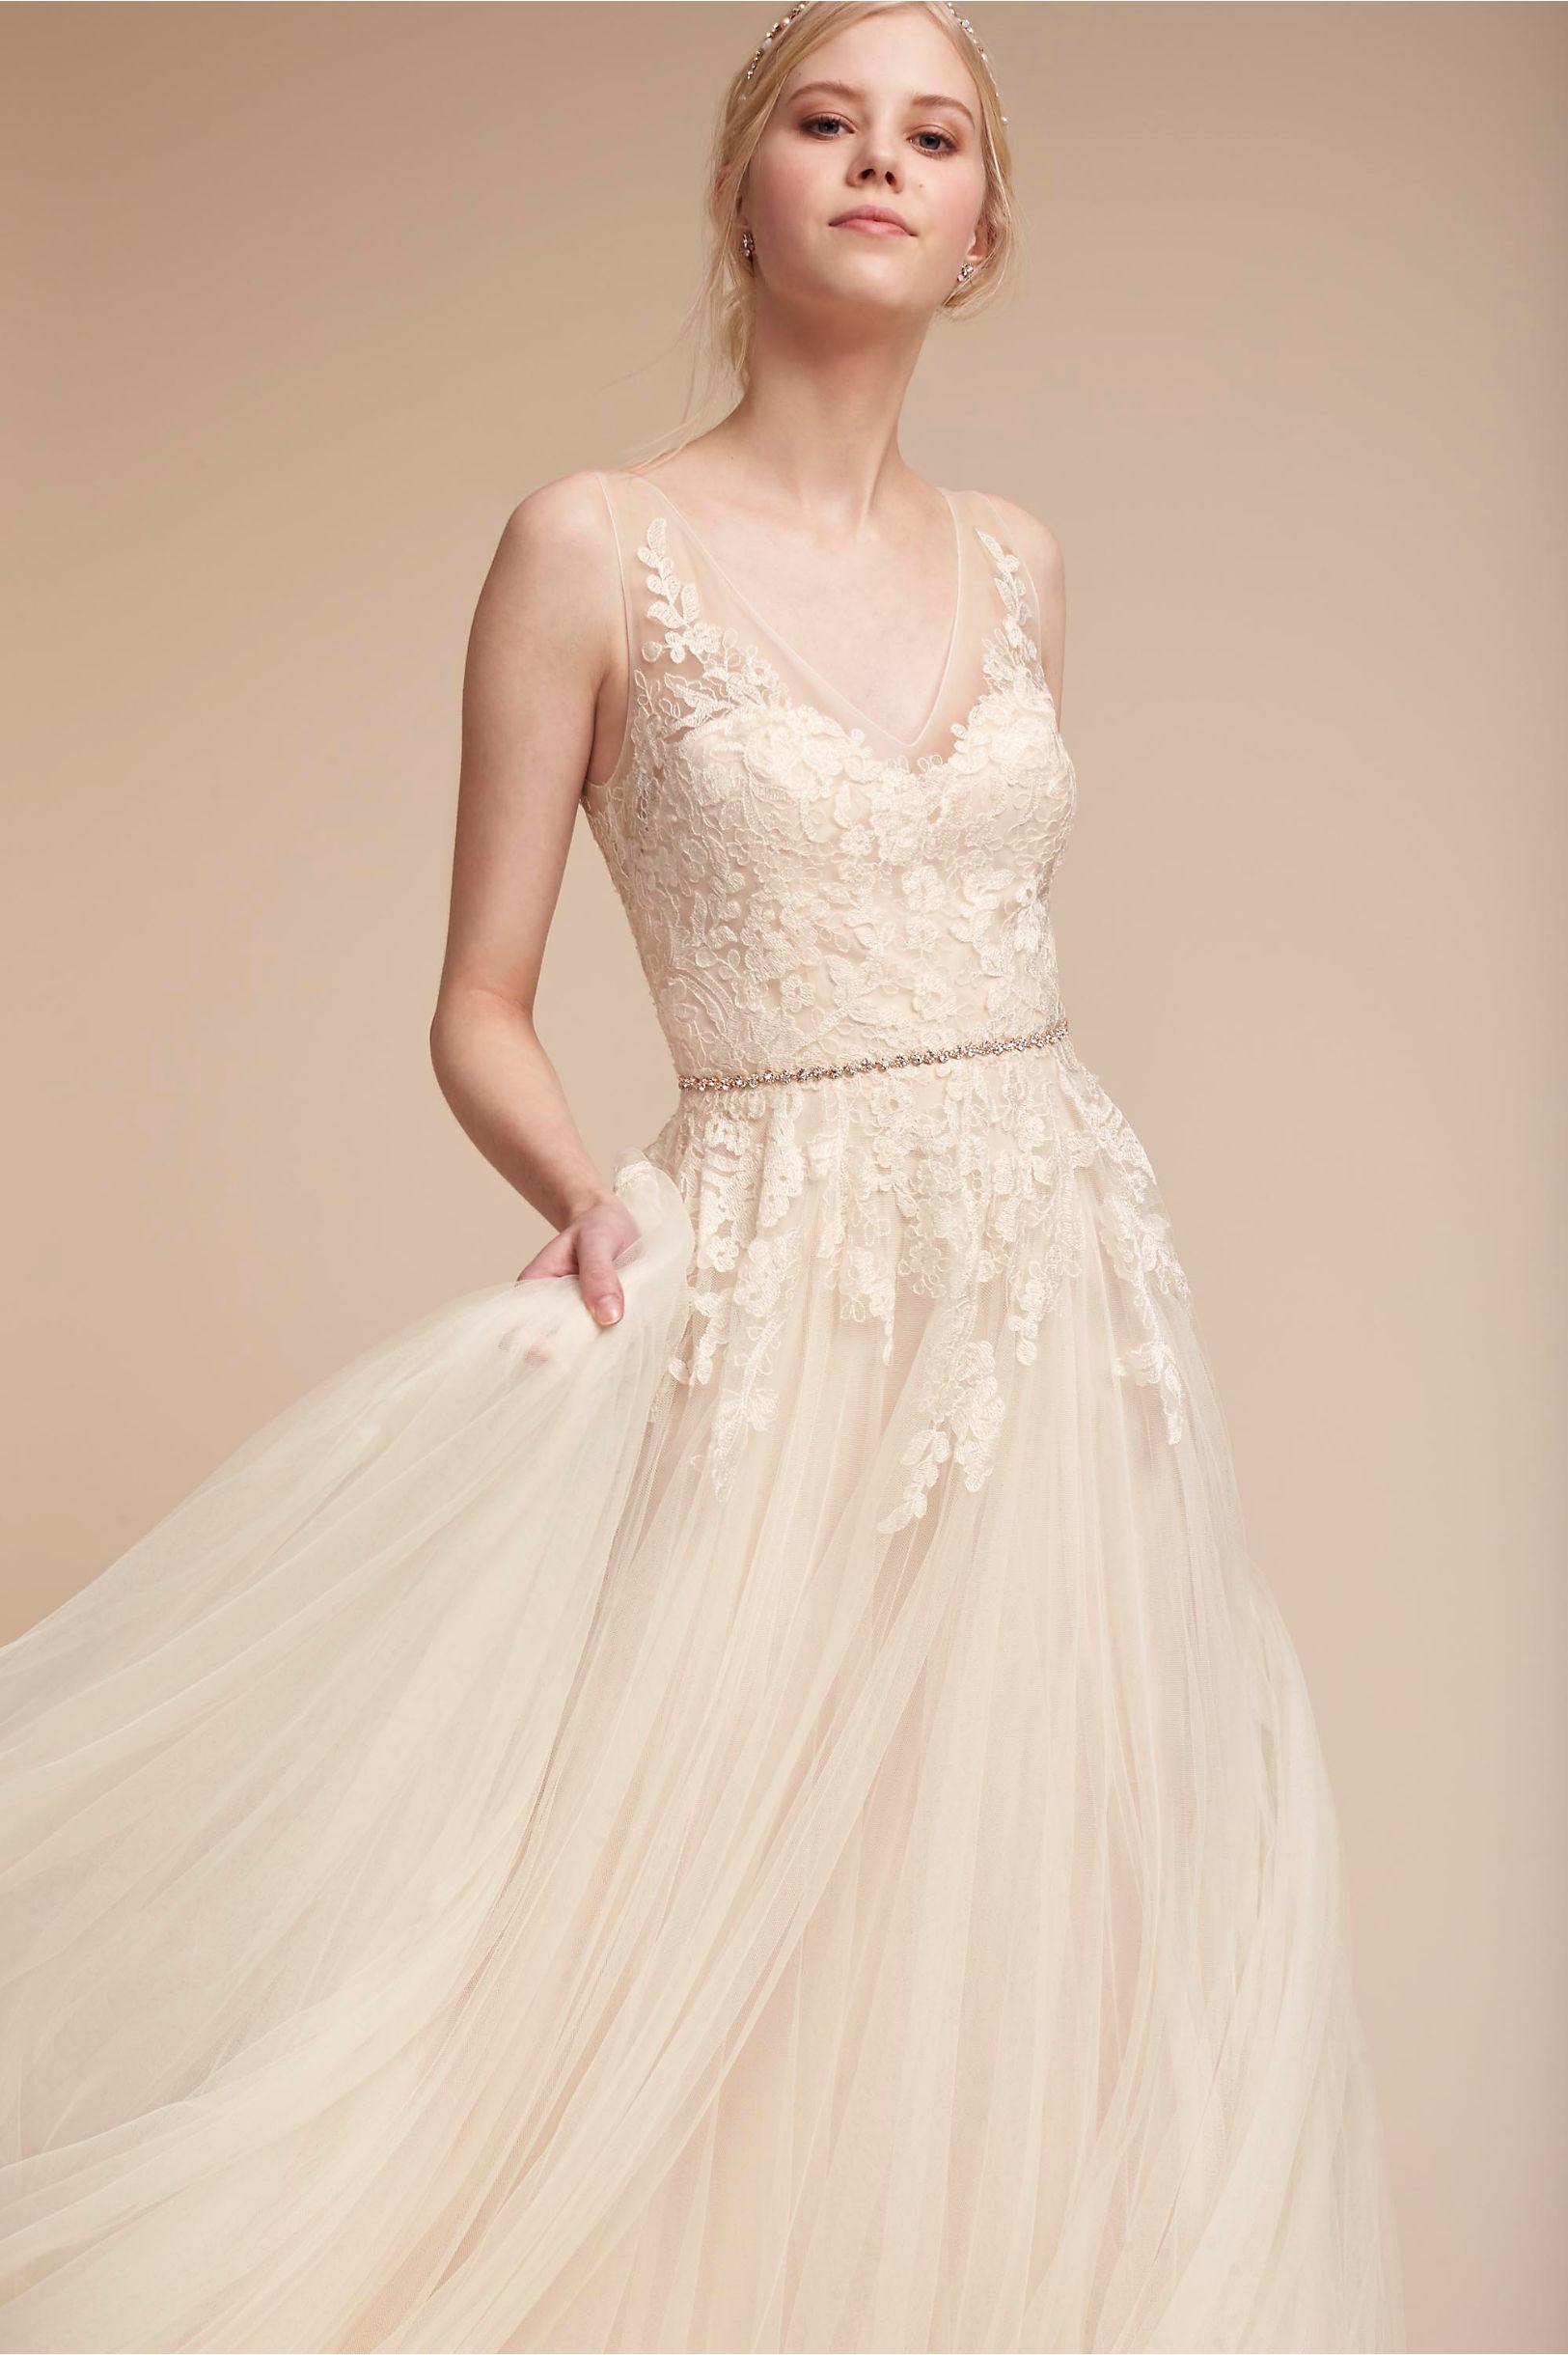 Romantic wedding dress